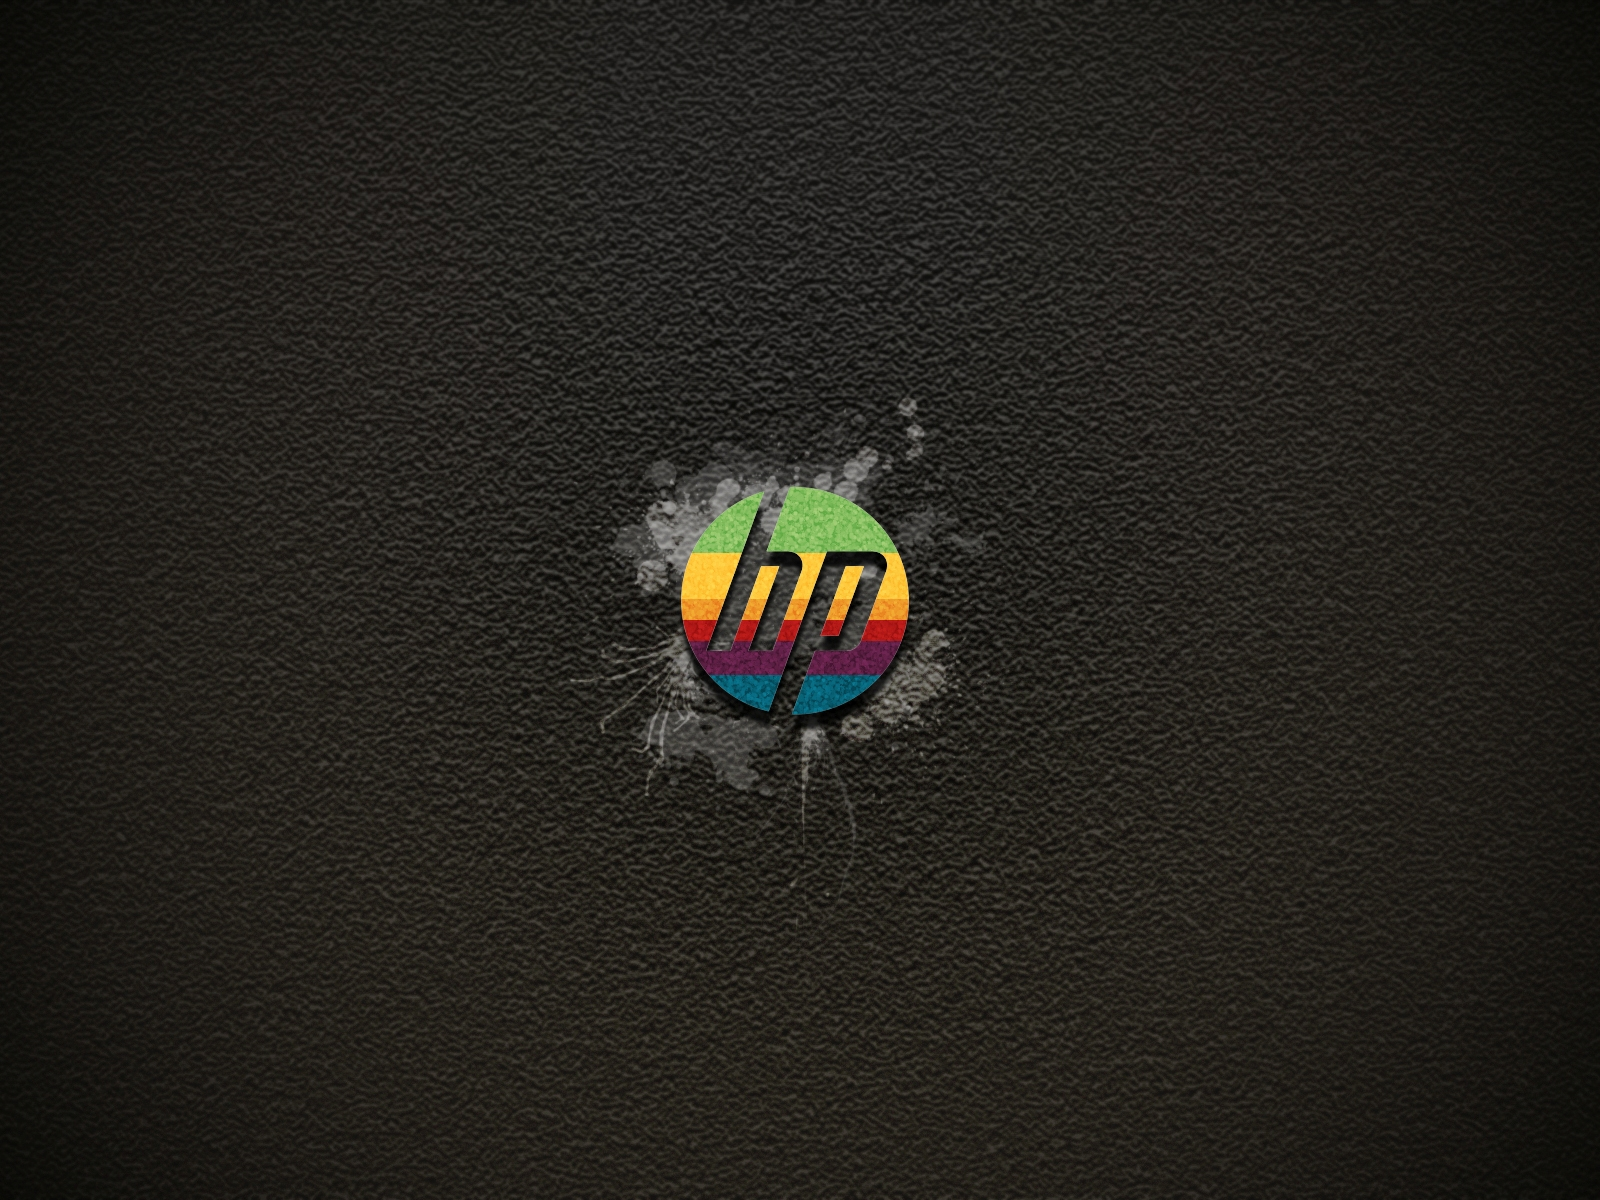 http://1.bp.blogspot.com/-MPaolQEYFHY/TjvmbgEKKnI/AAAAAAAAApU/iNU1VEnxqzE/s1600/hp-color-logo-wallpapers_21030_1600x1200.jpg